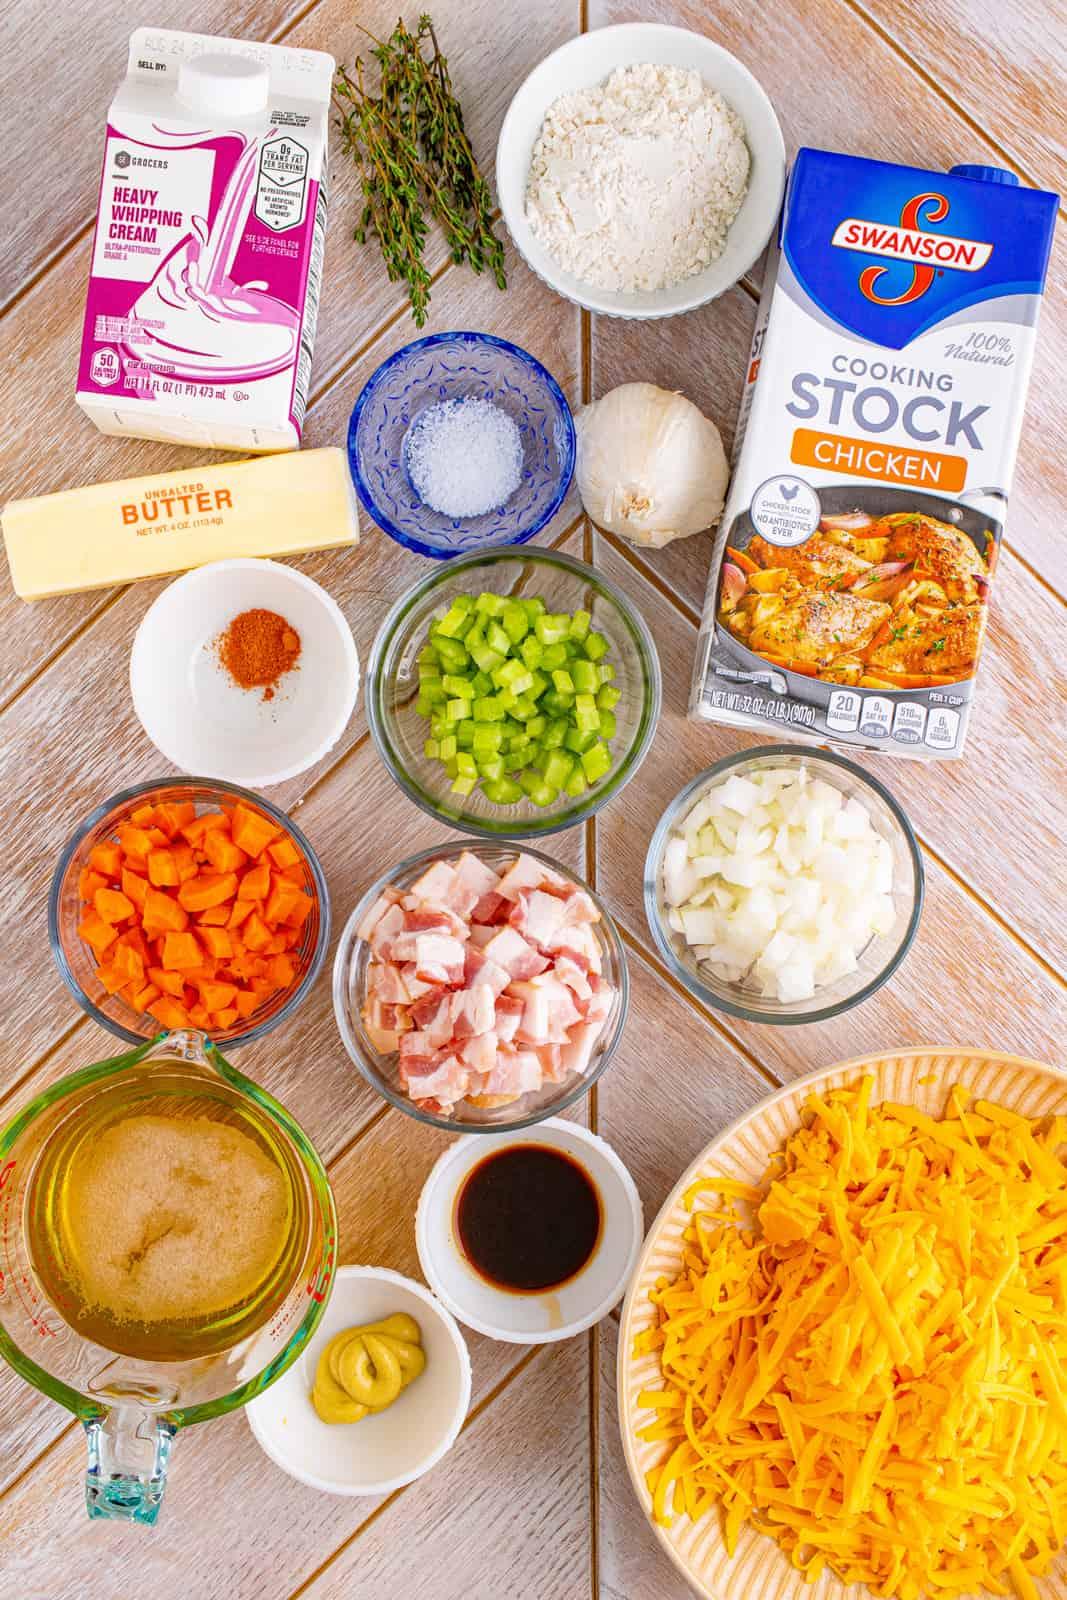 Ingredients needed too make Beer Cheese Soup